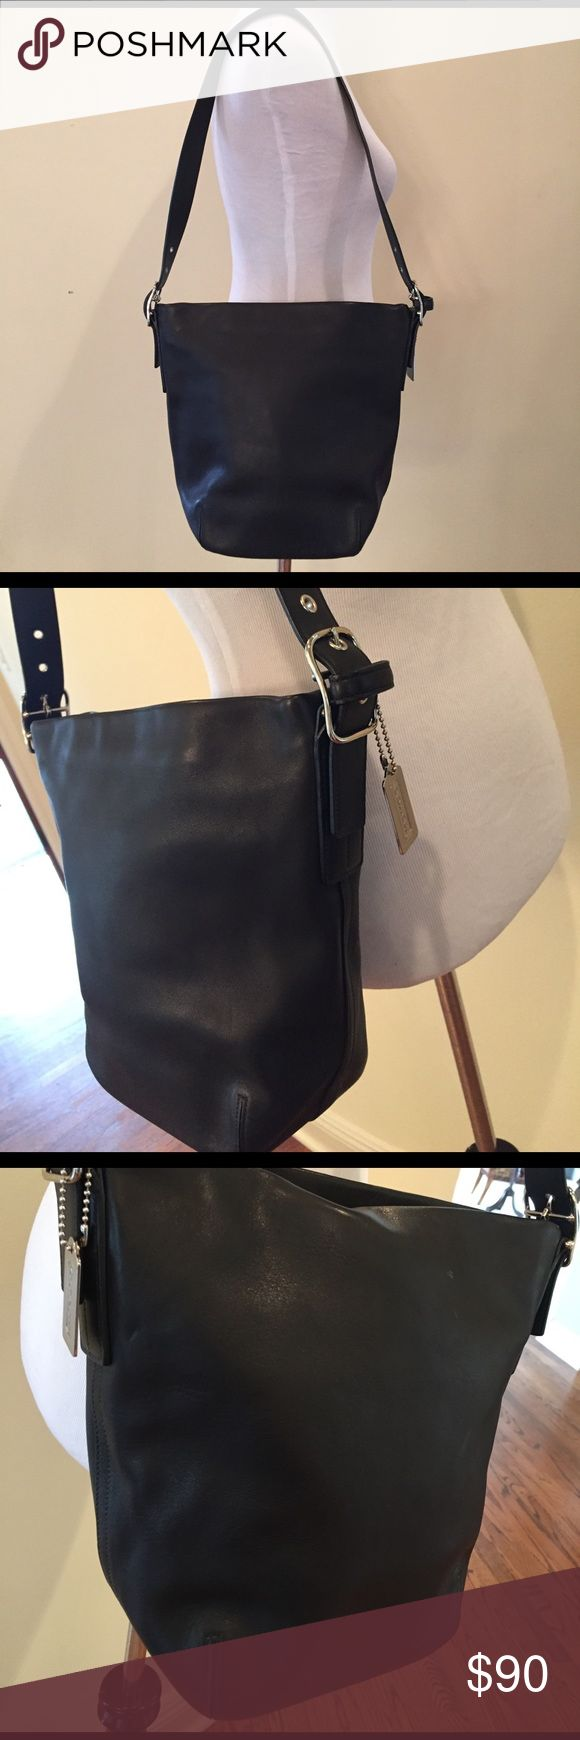 COACH Black Leather Hobo Shoulder Bag Great Condition! Coach Bags Shoulder Bags